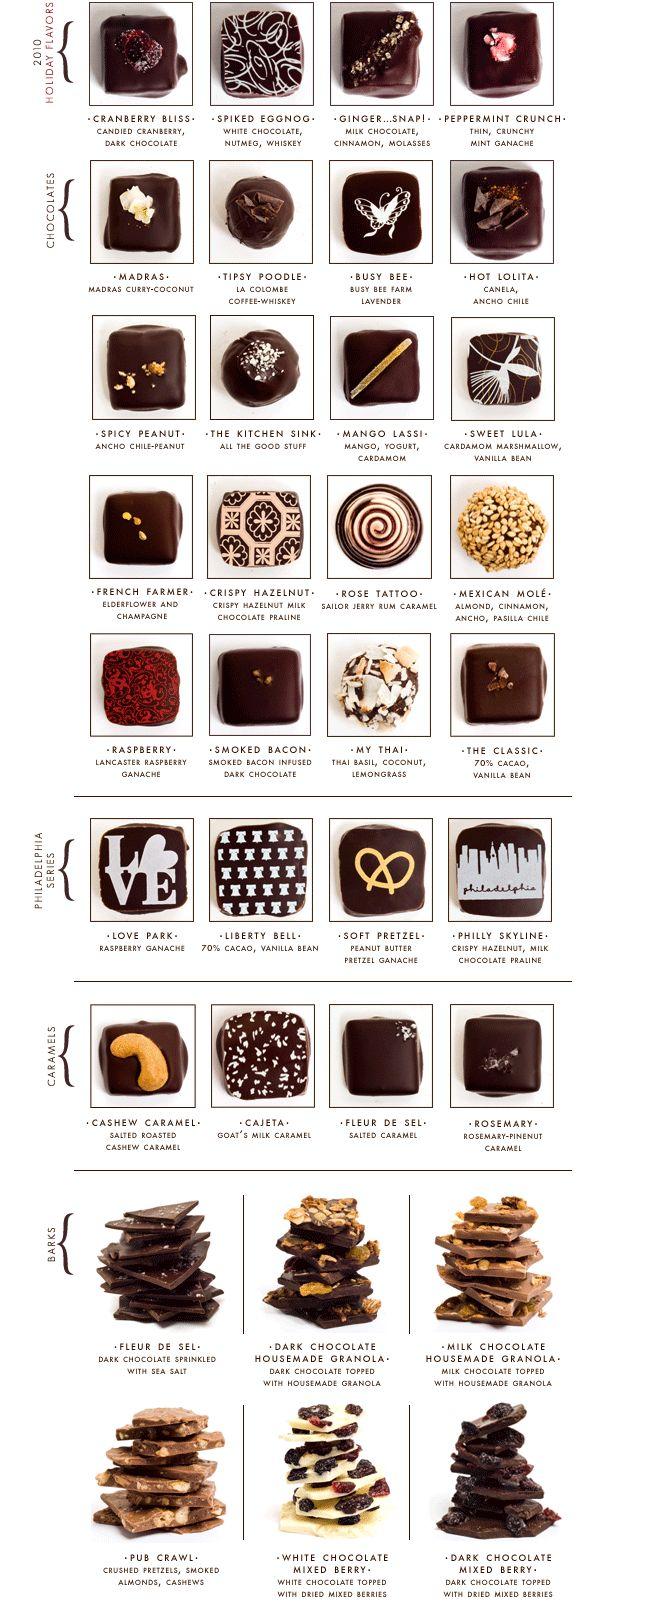 Hot Lolita Ancho Chile Chocolate